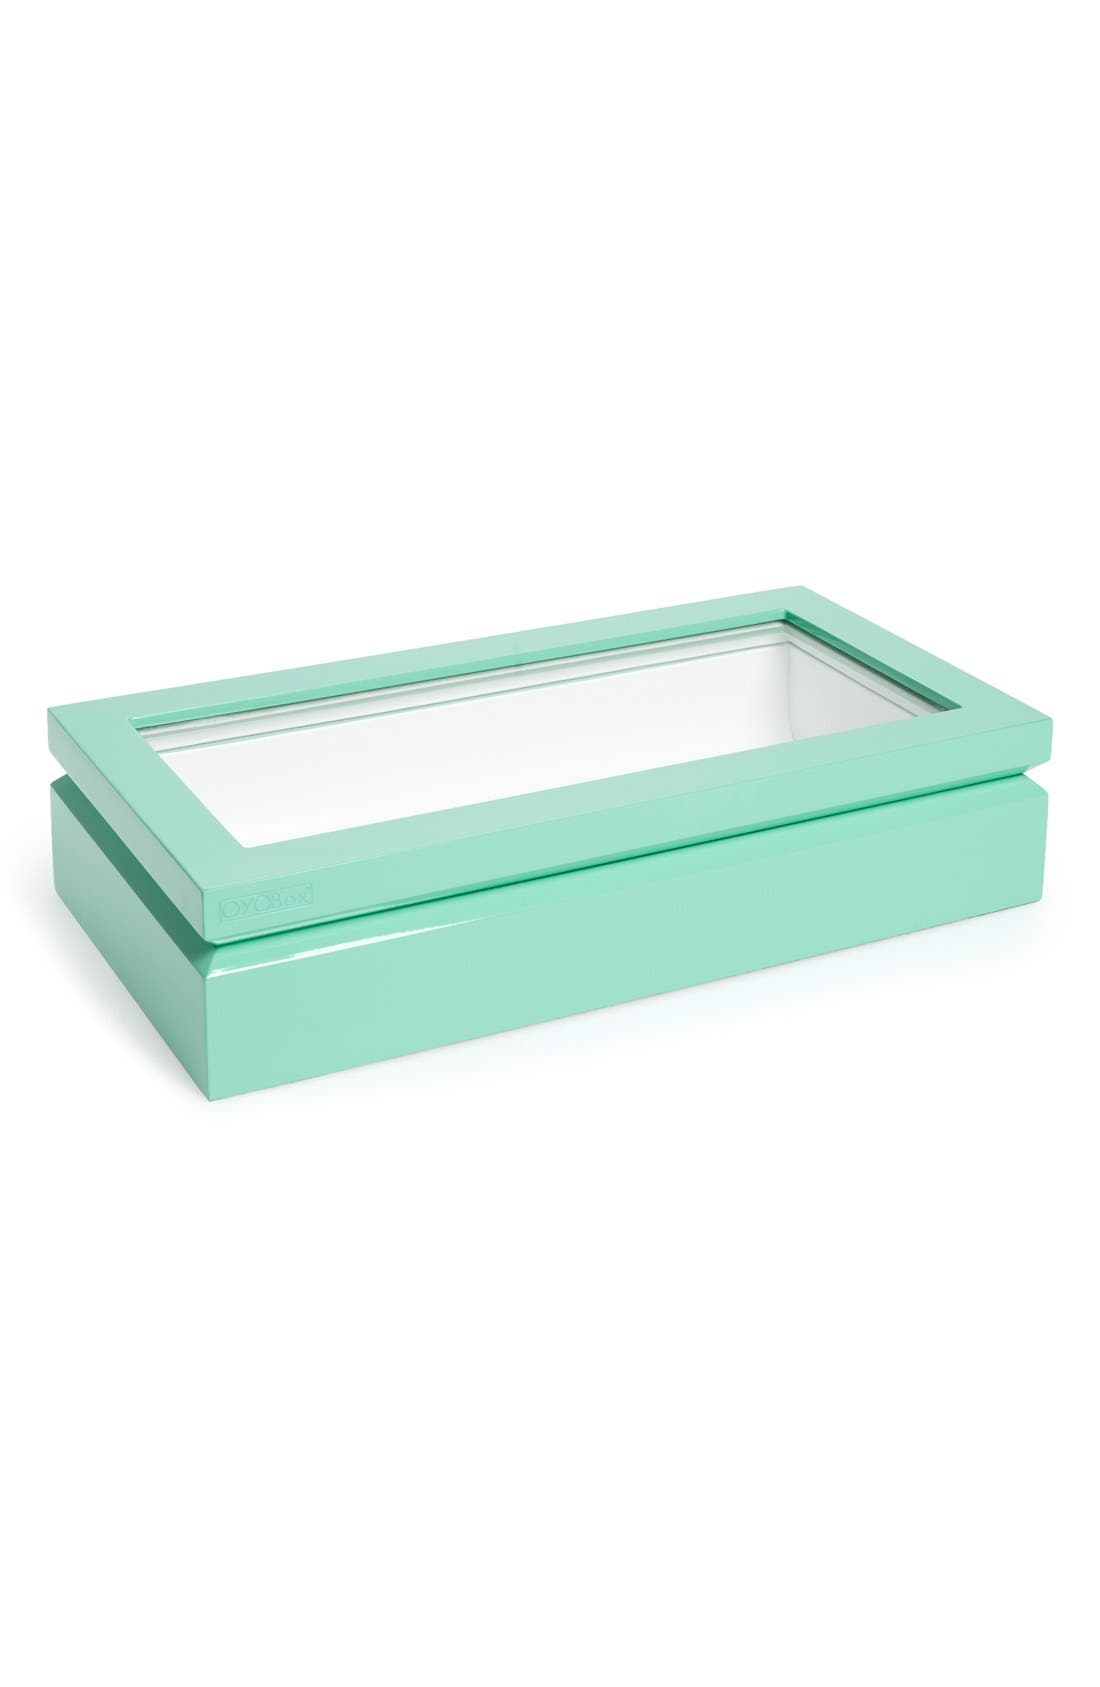 OYOBox Lacquered Wood Window Top Eyewear Organizer Case